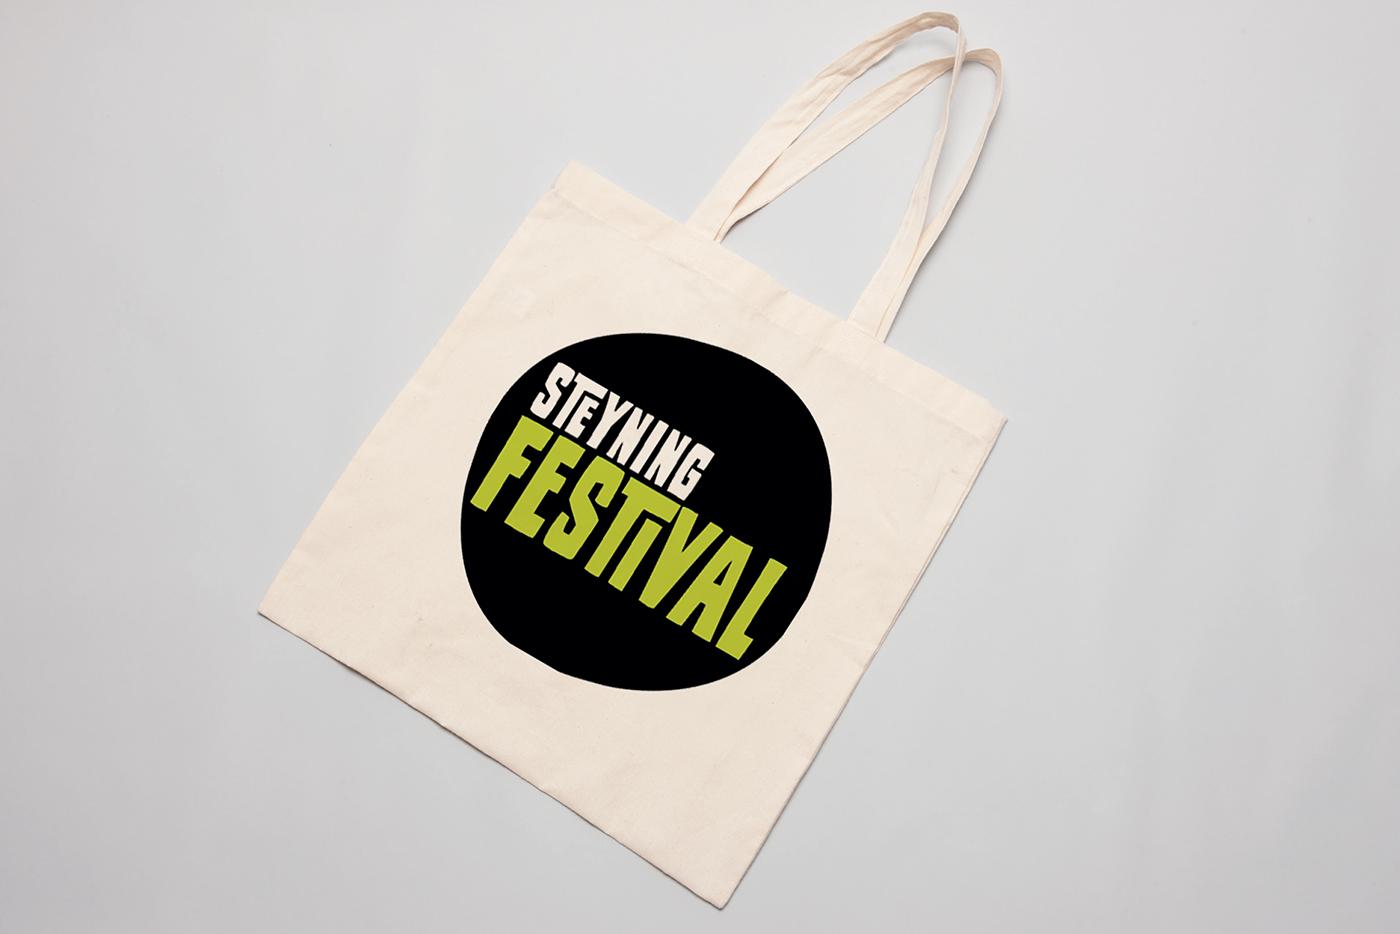 STEYNING FESTIVAL TEMPLATE-12